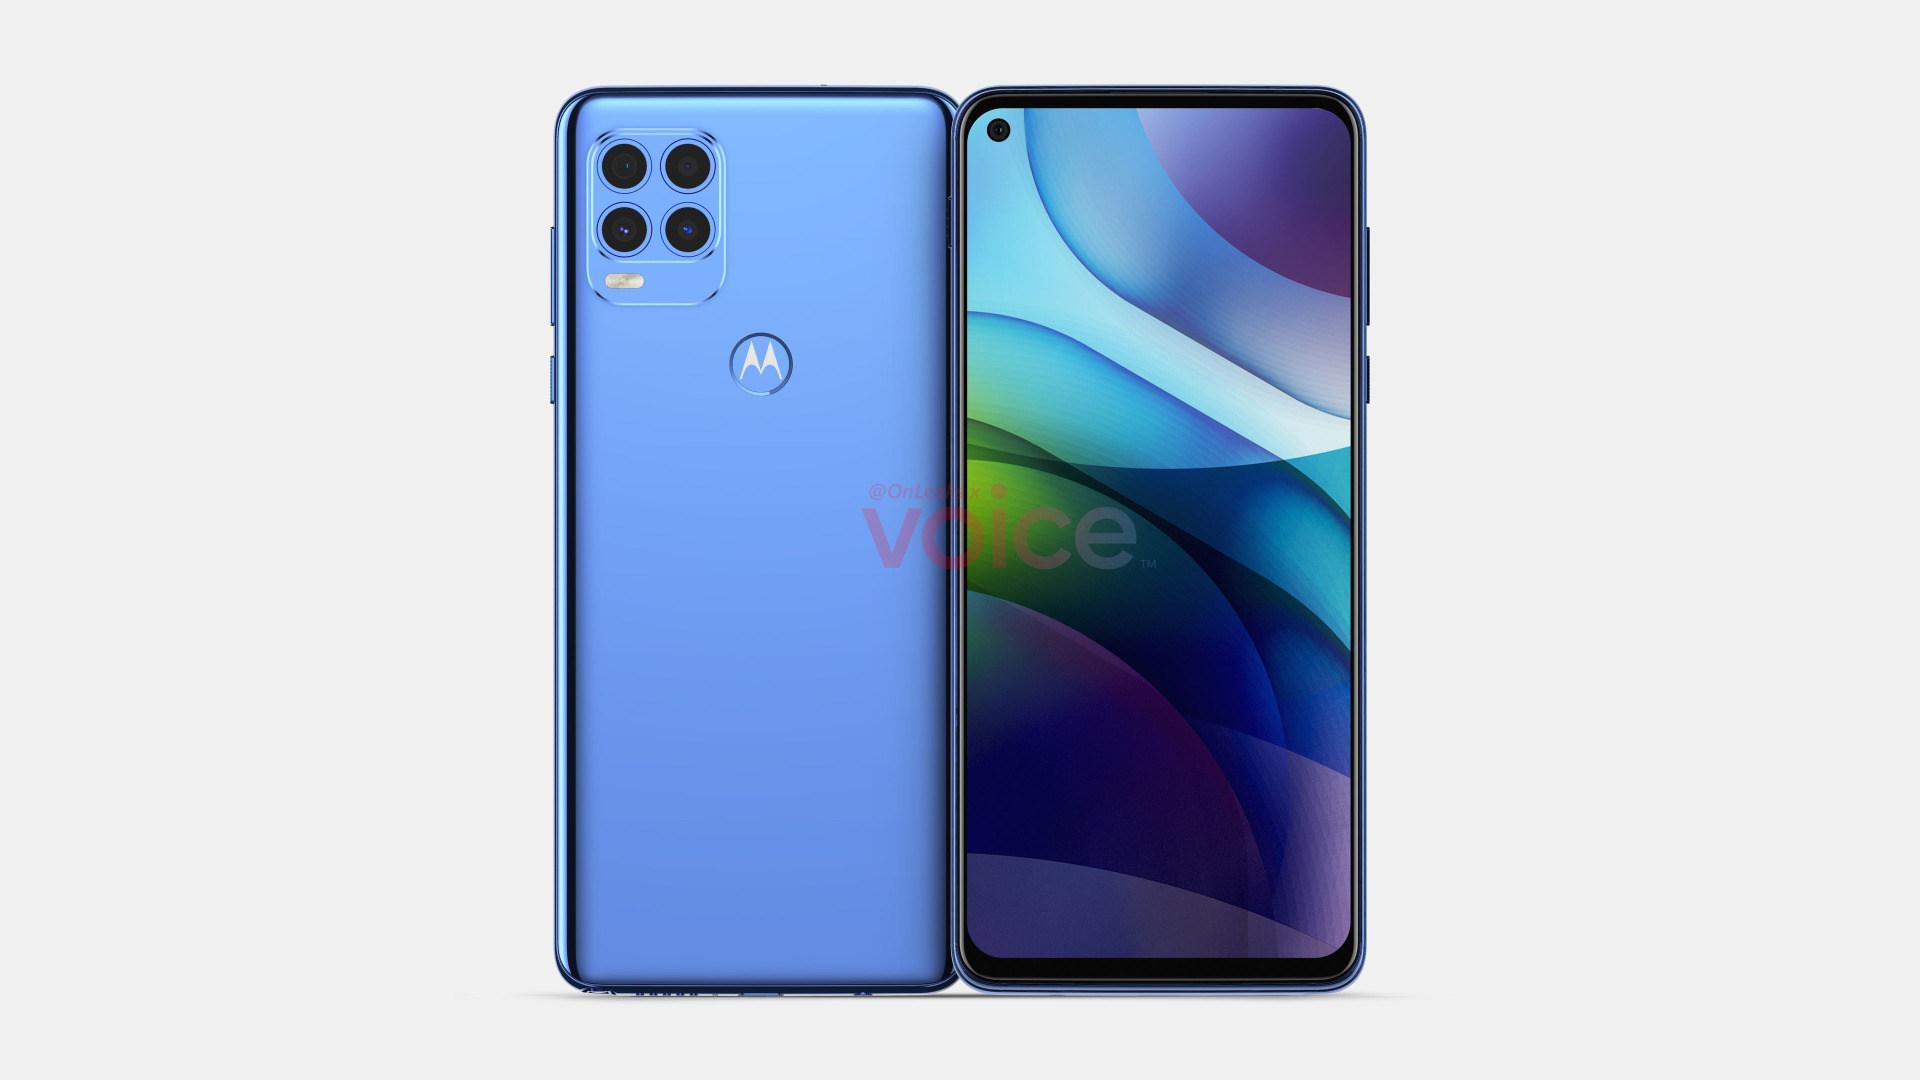 Smartphone, Leak, Motorola, Motorola Moto G, Moto G Stylus 2021